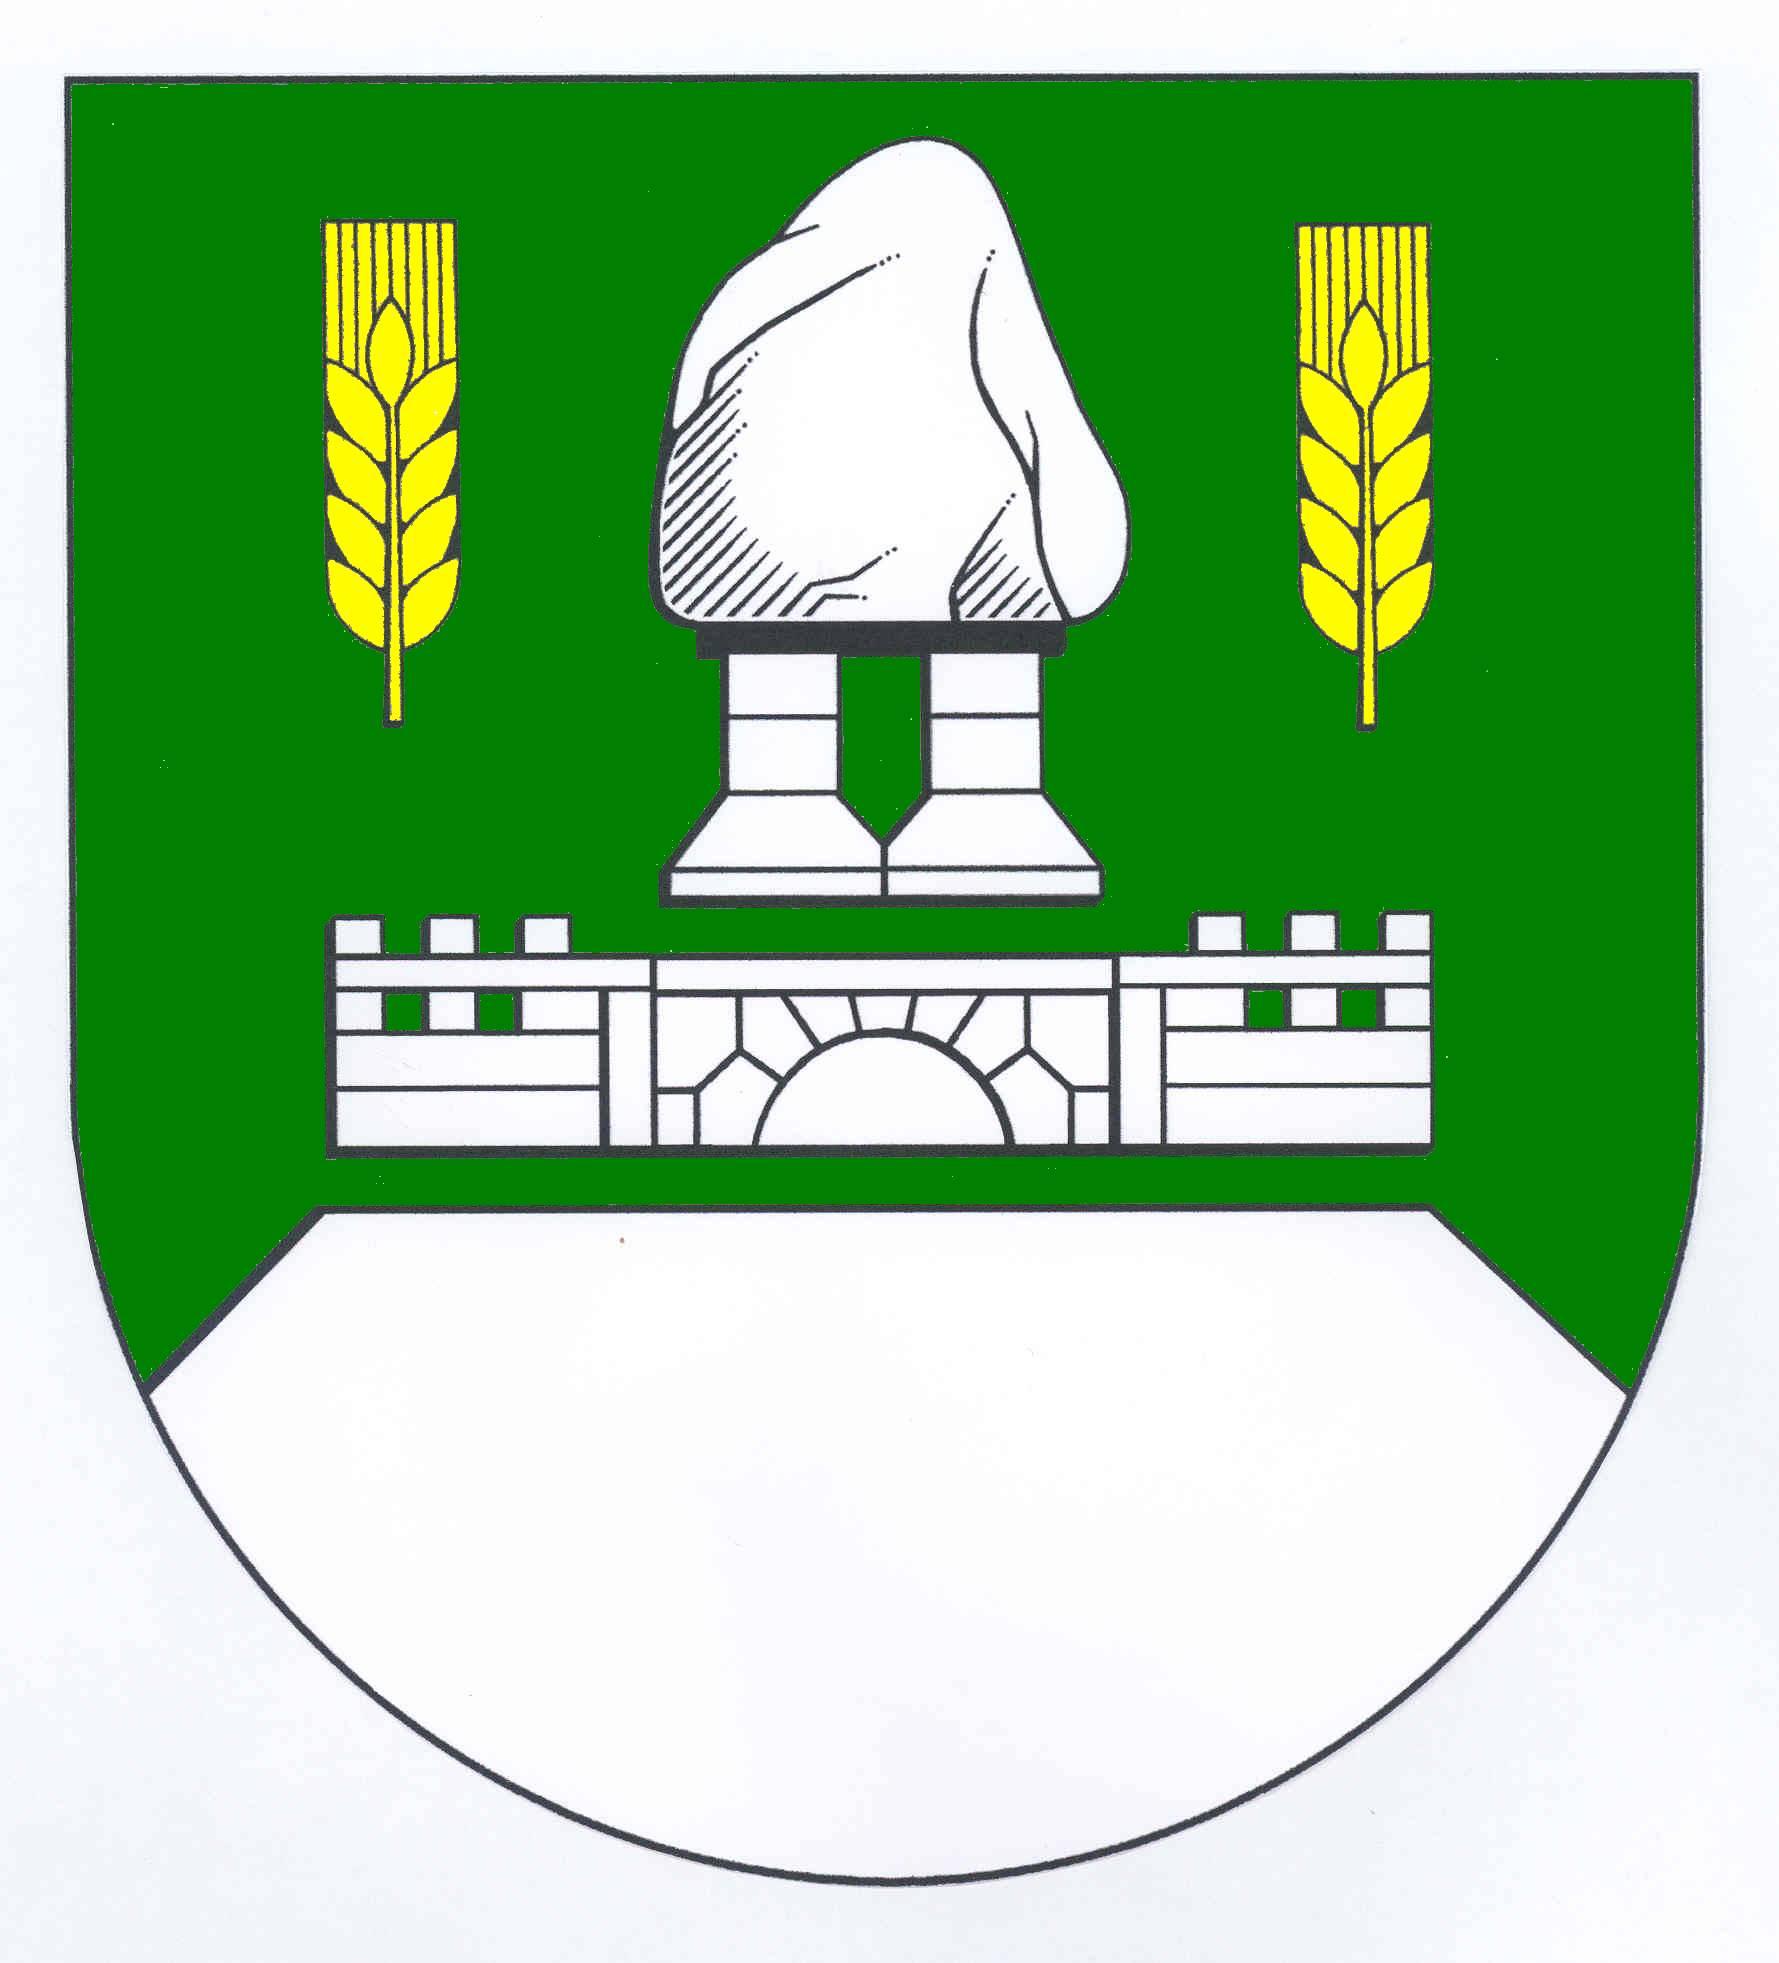 Wappen GemeindeEpenwöhrden, Kreis Dithmarschen